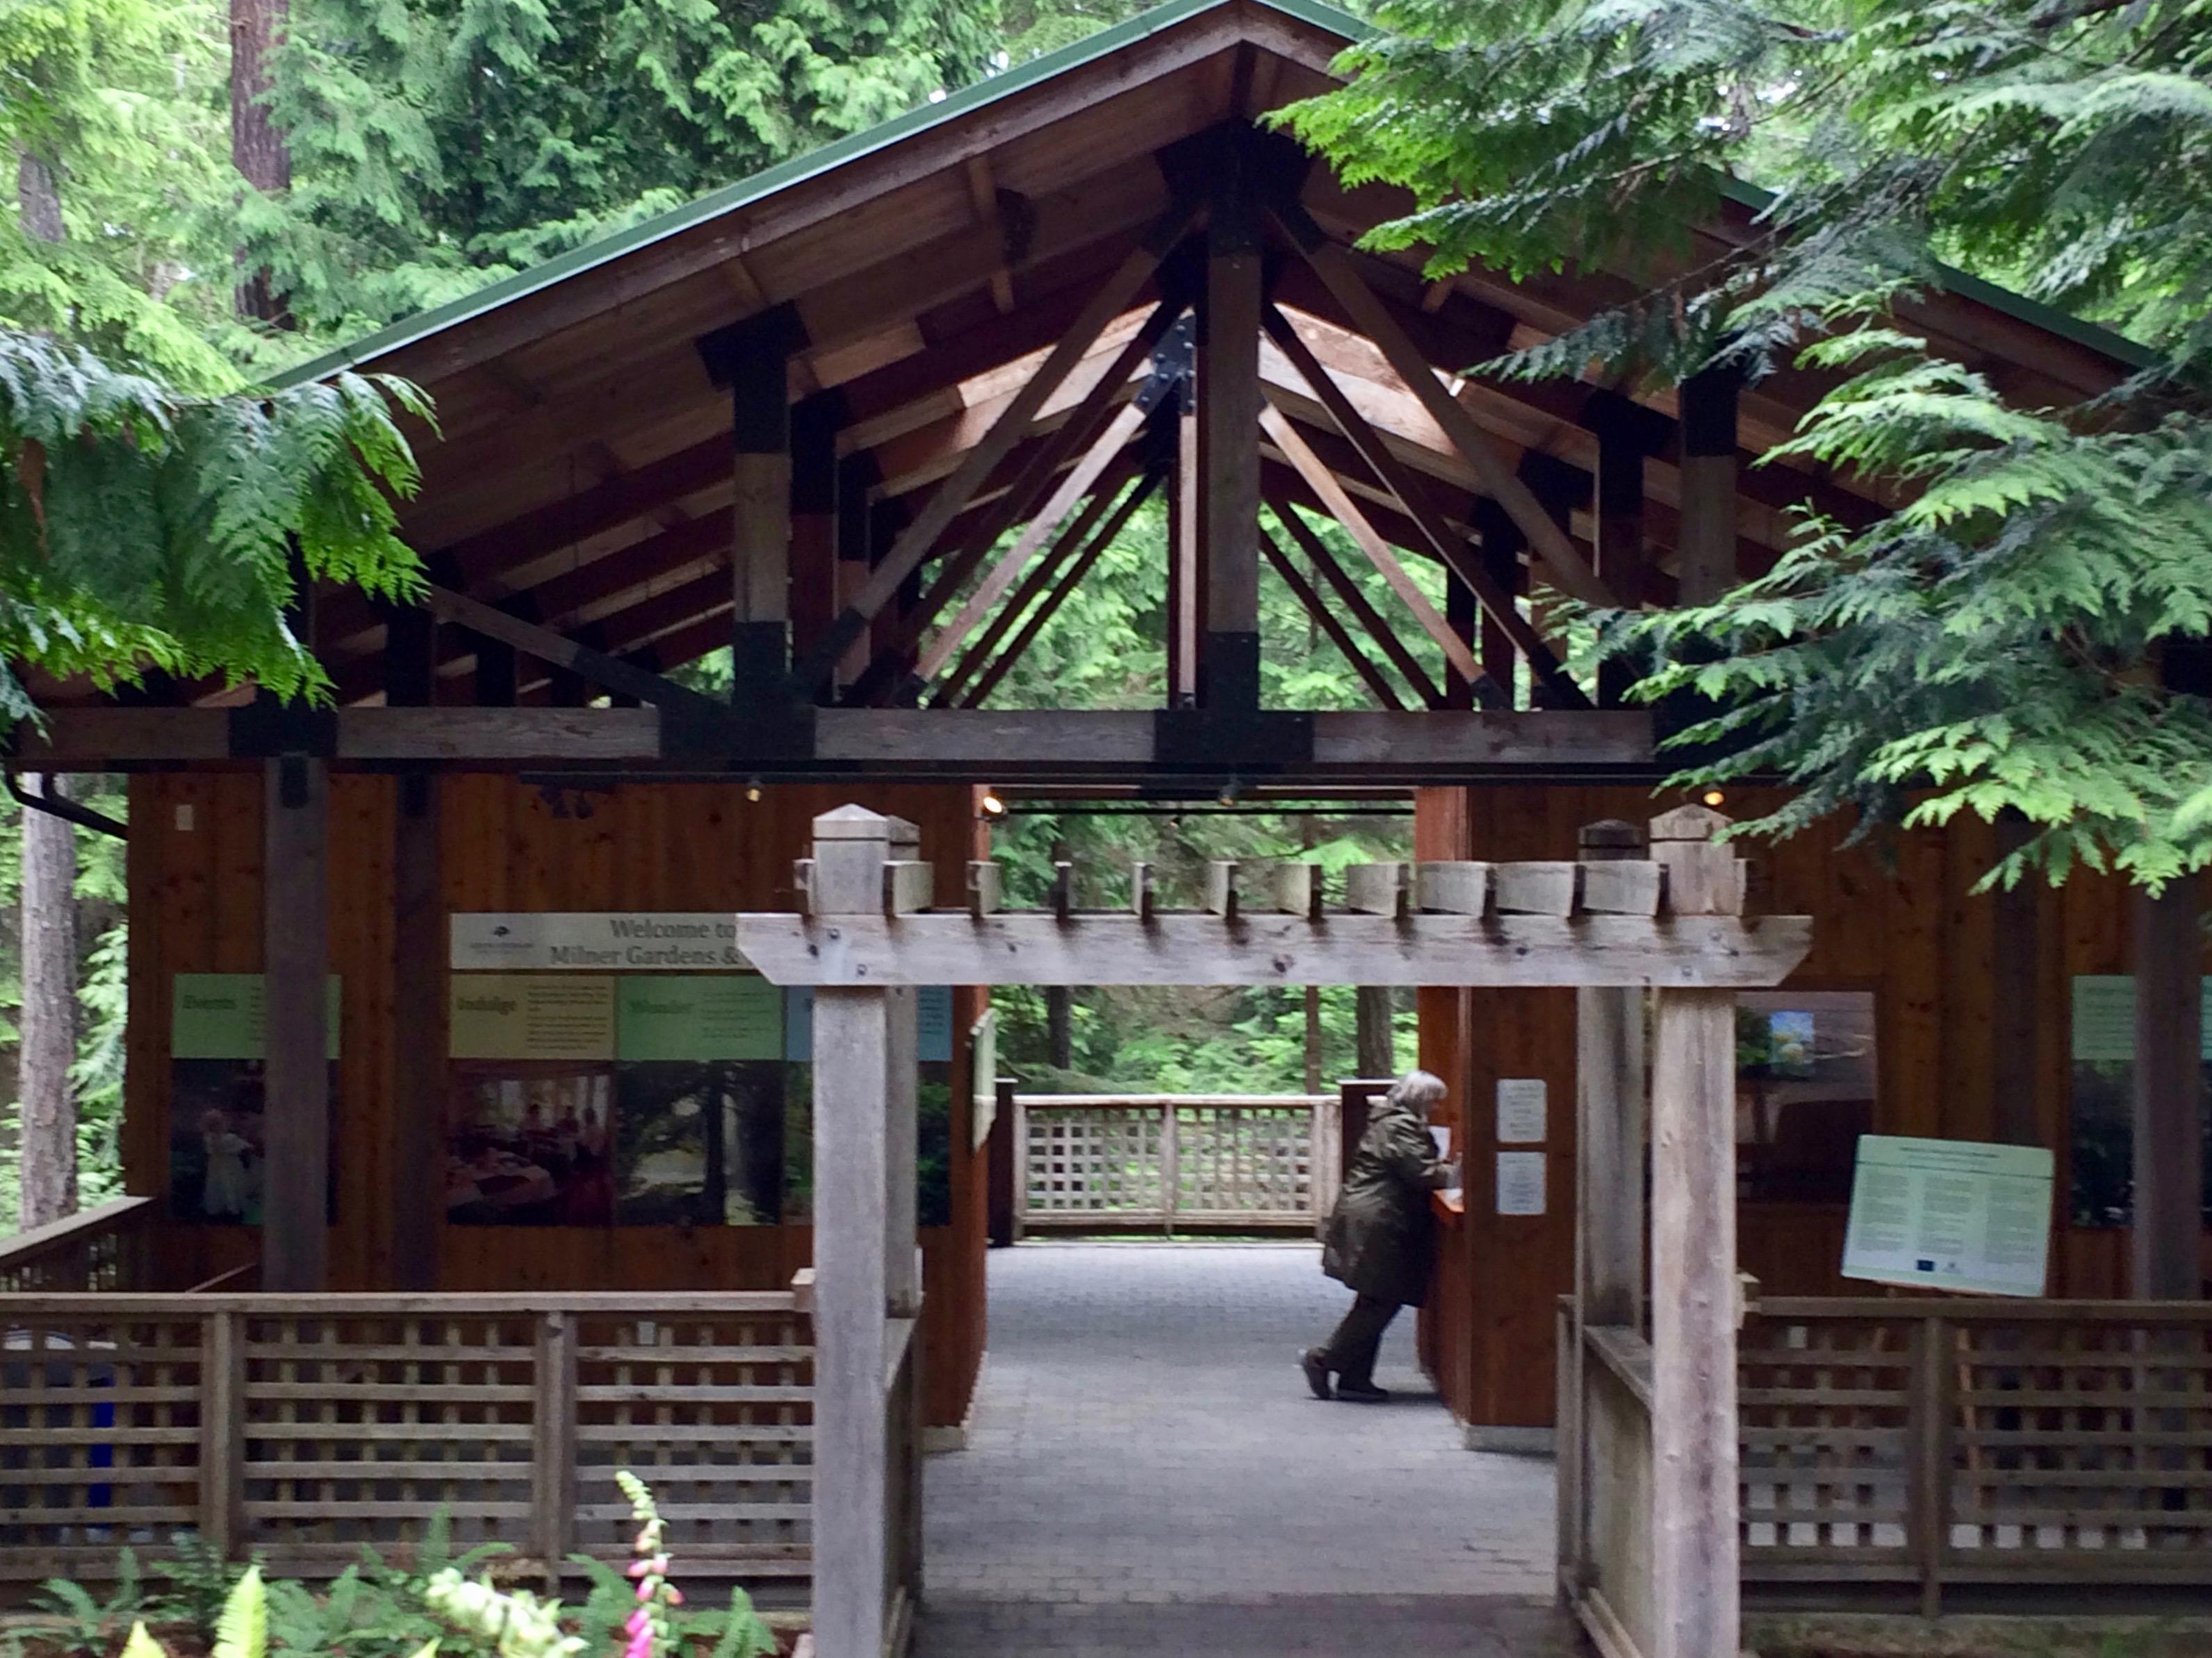 Entry gate at Mlner Gardens